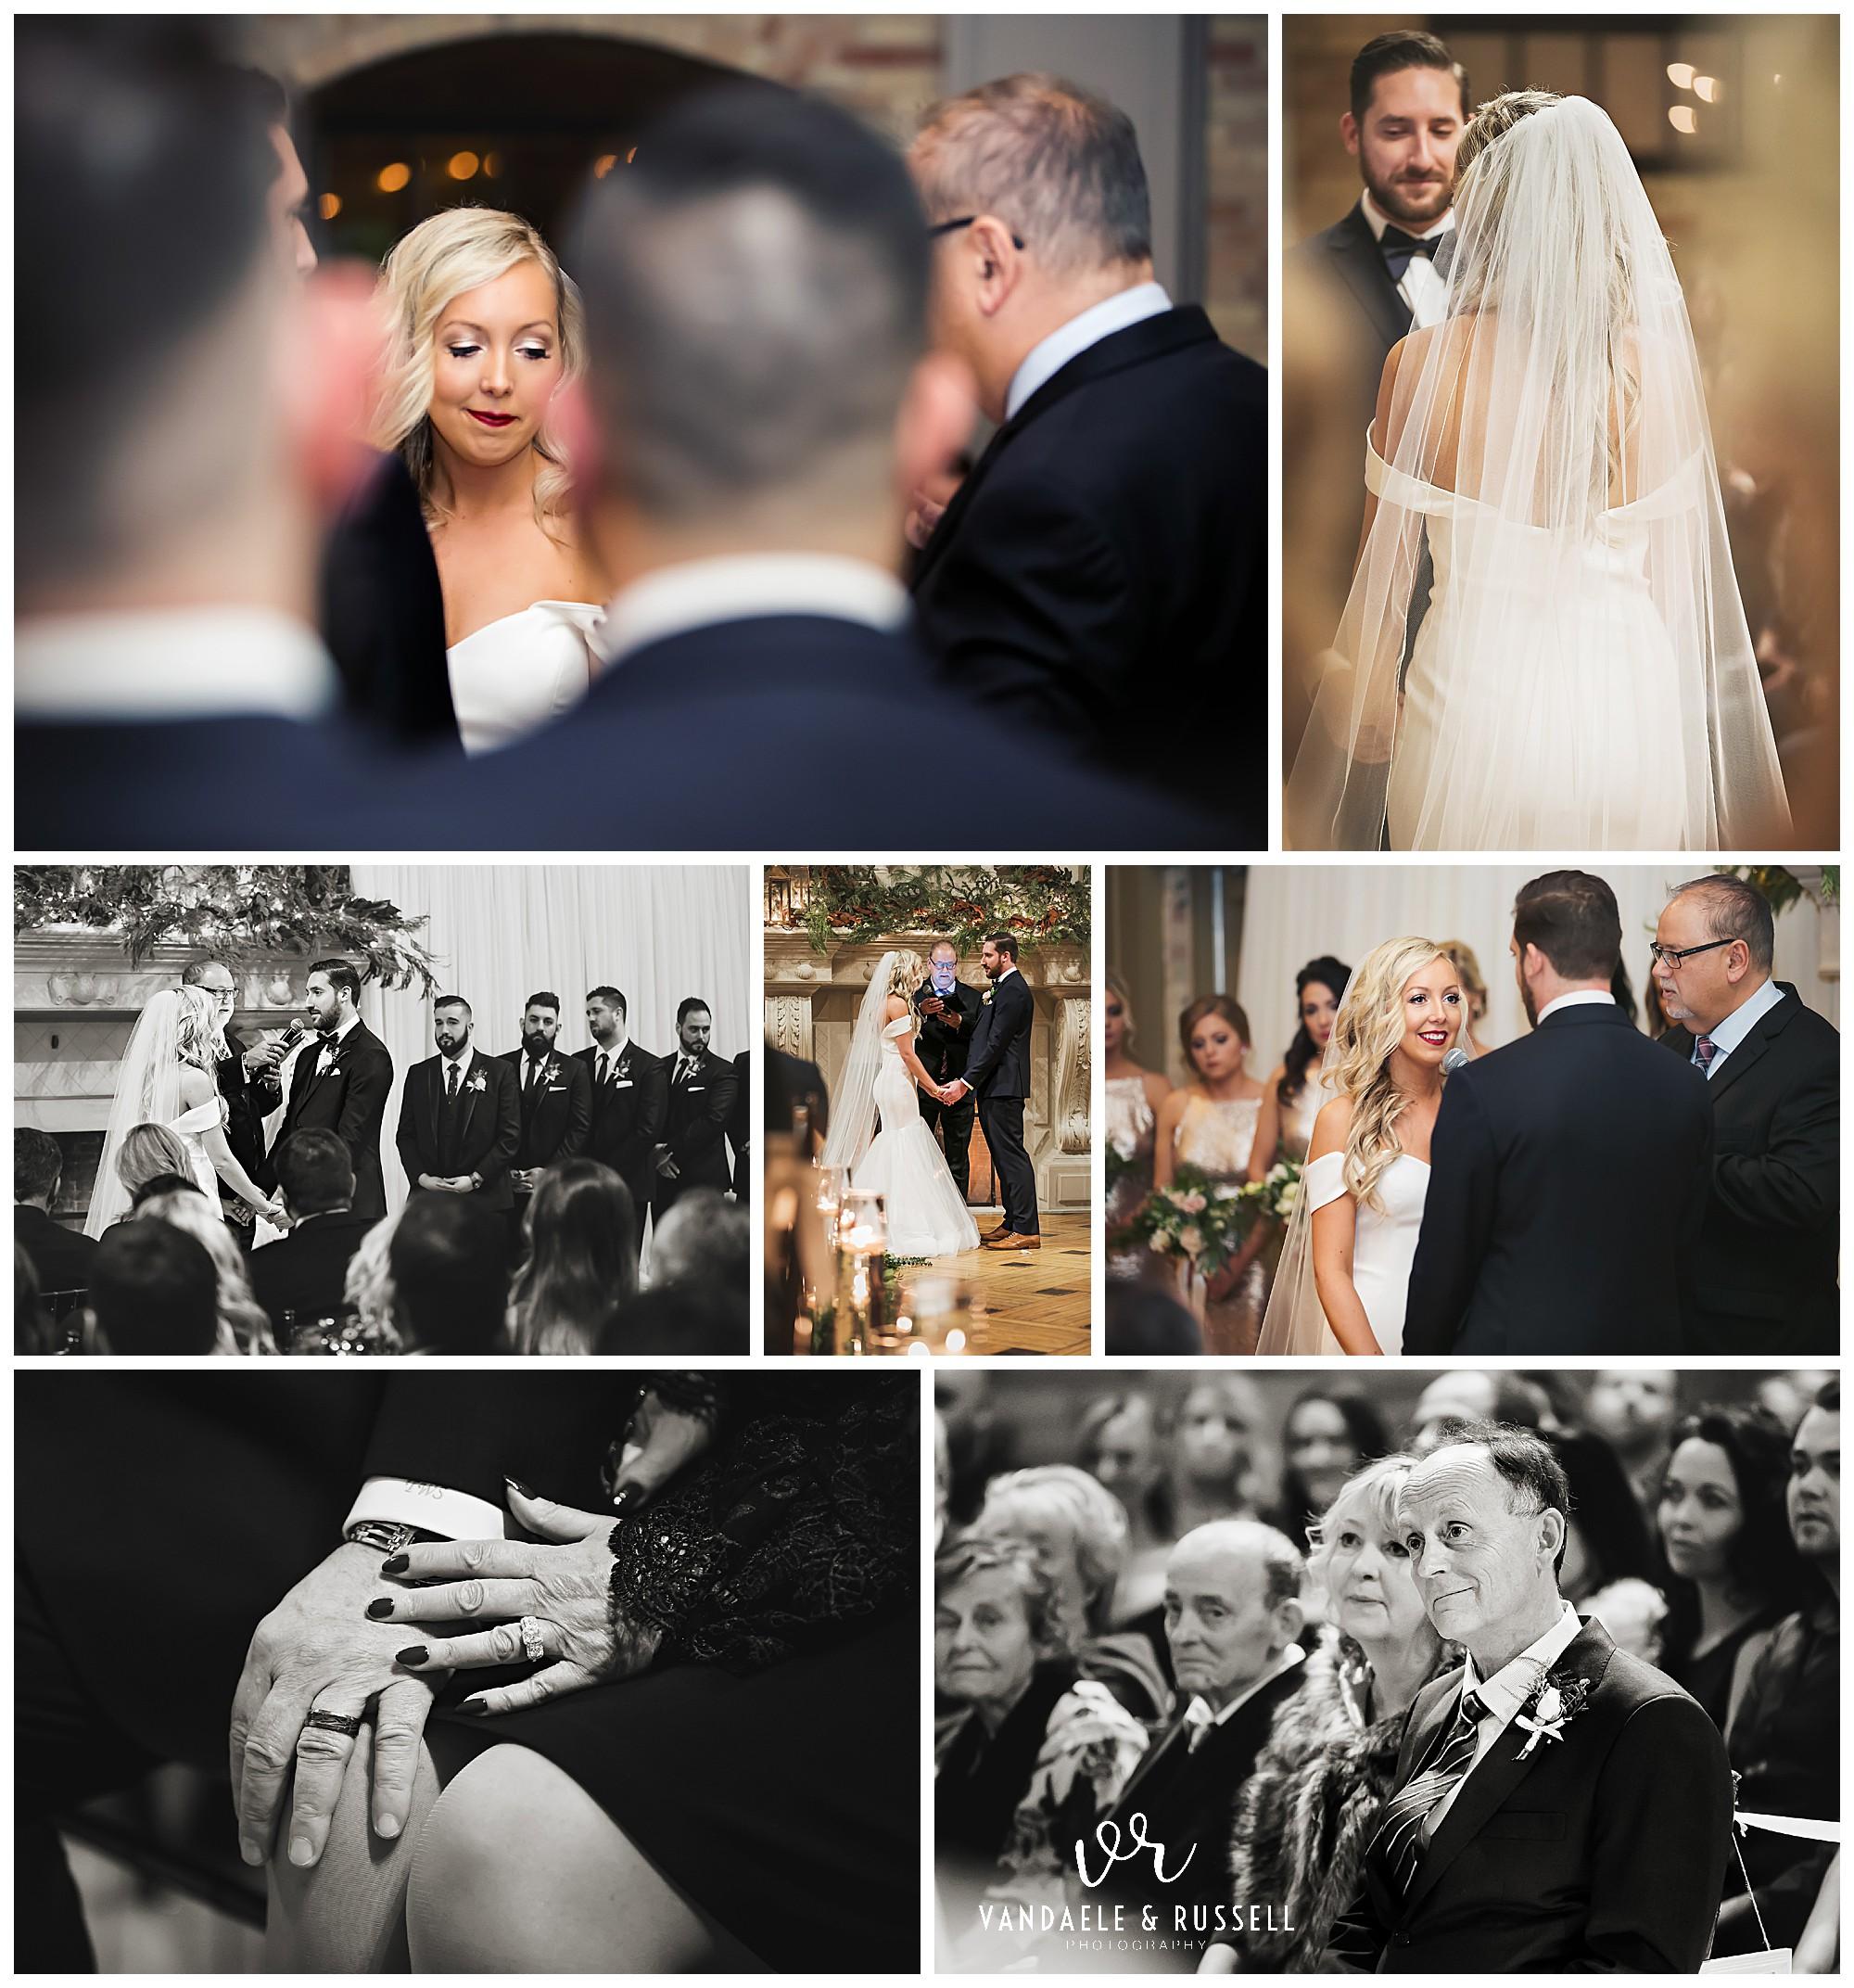 Hacienda-Sarria-Wedding-Photos-NYE-Michelle-Matt-VanDaele-Russell_0034.jpg